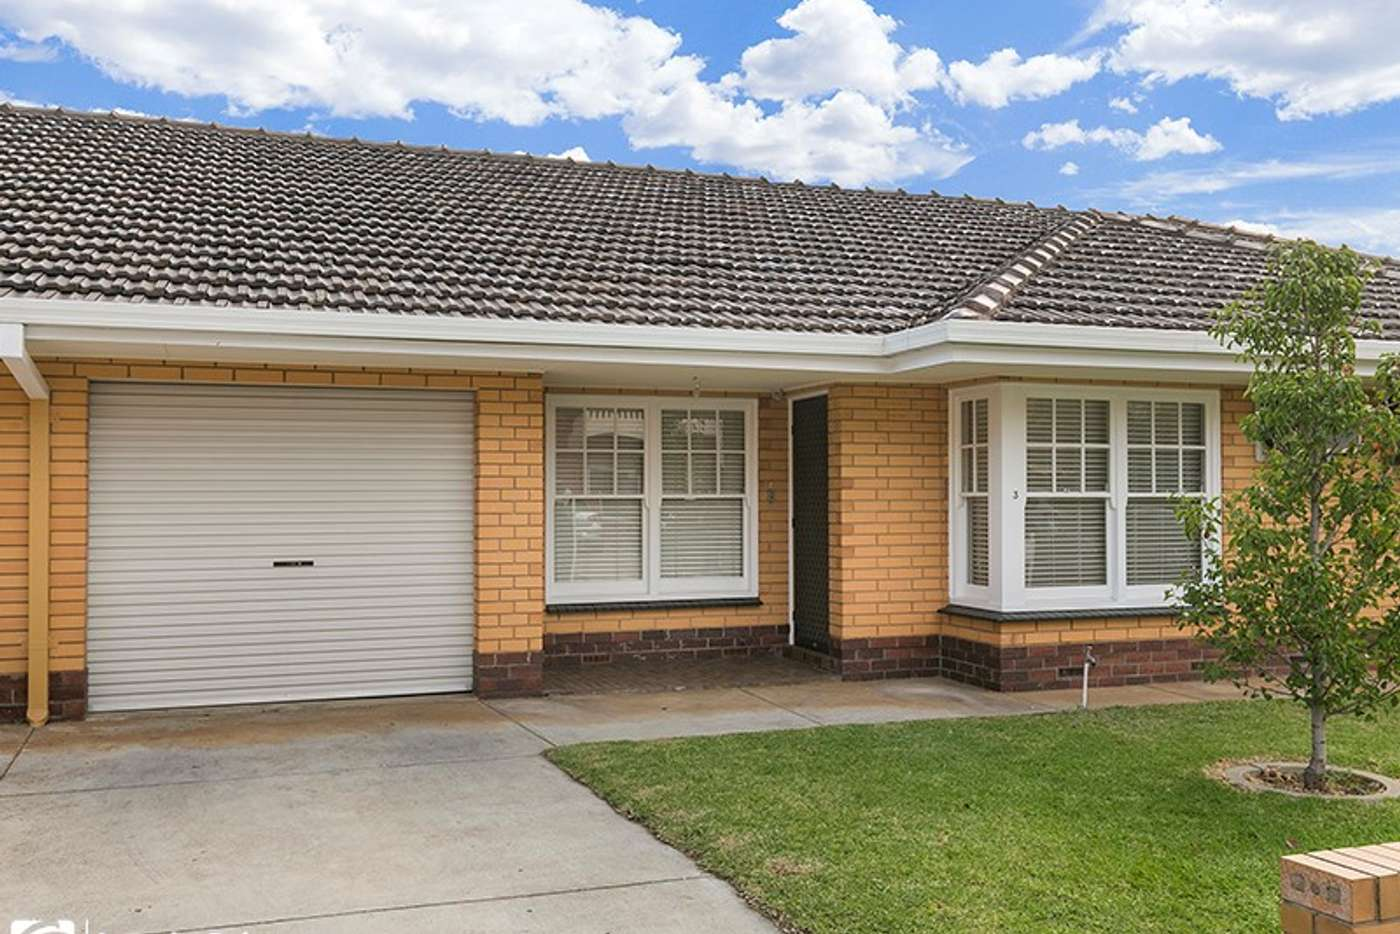 Main view of Homely unit listing, 3/35 Augusta Street, Glenelg SA 5045